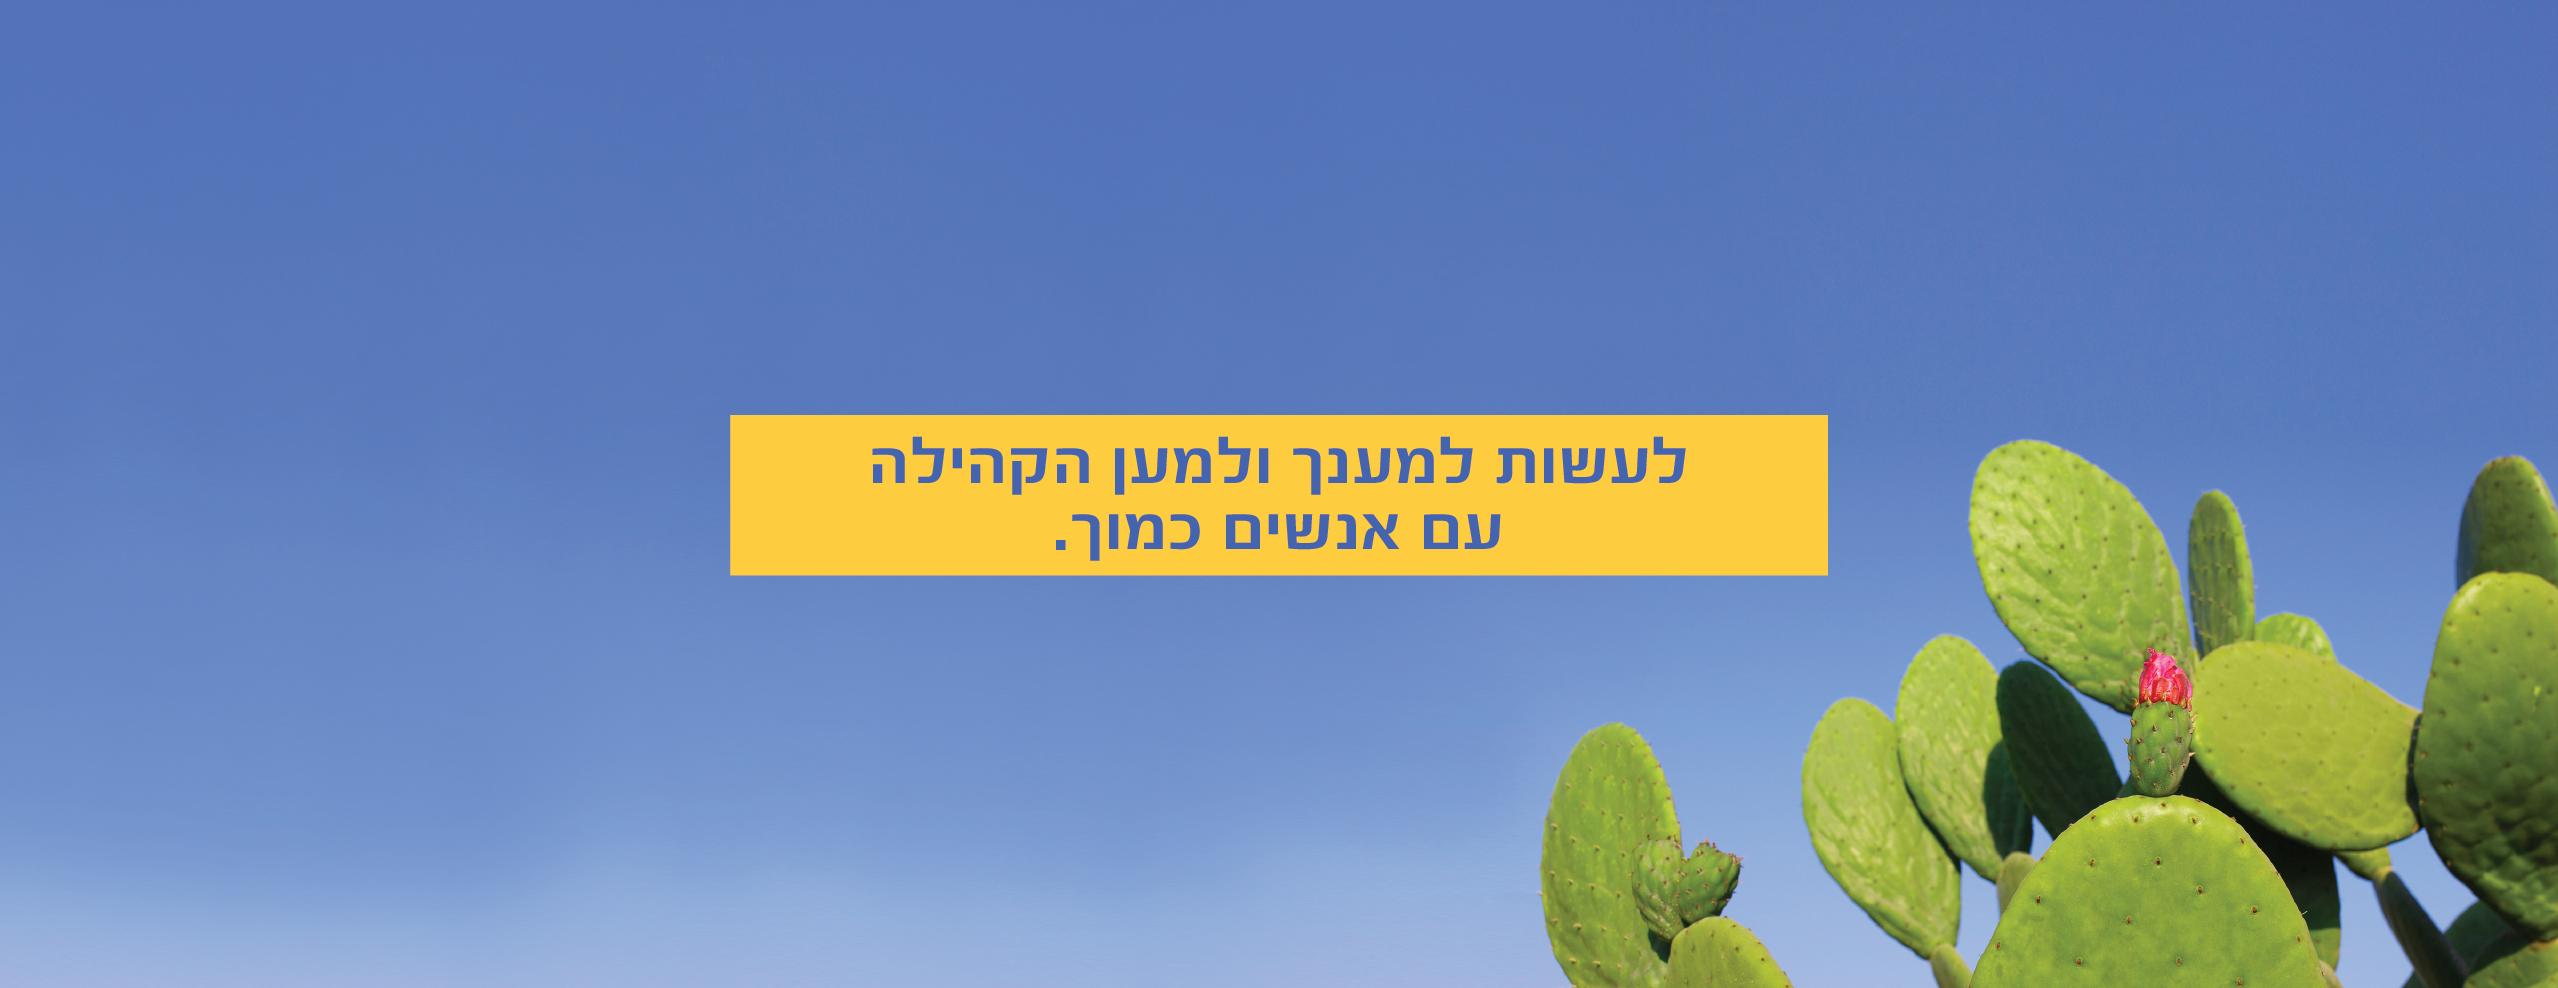 סטריפ אתר2-06